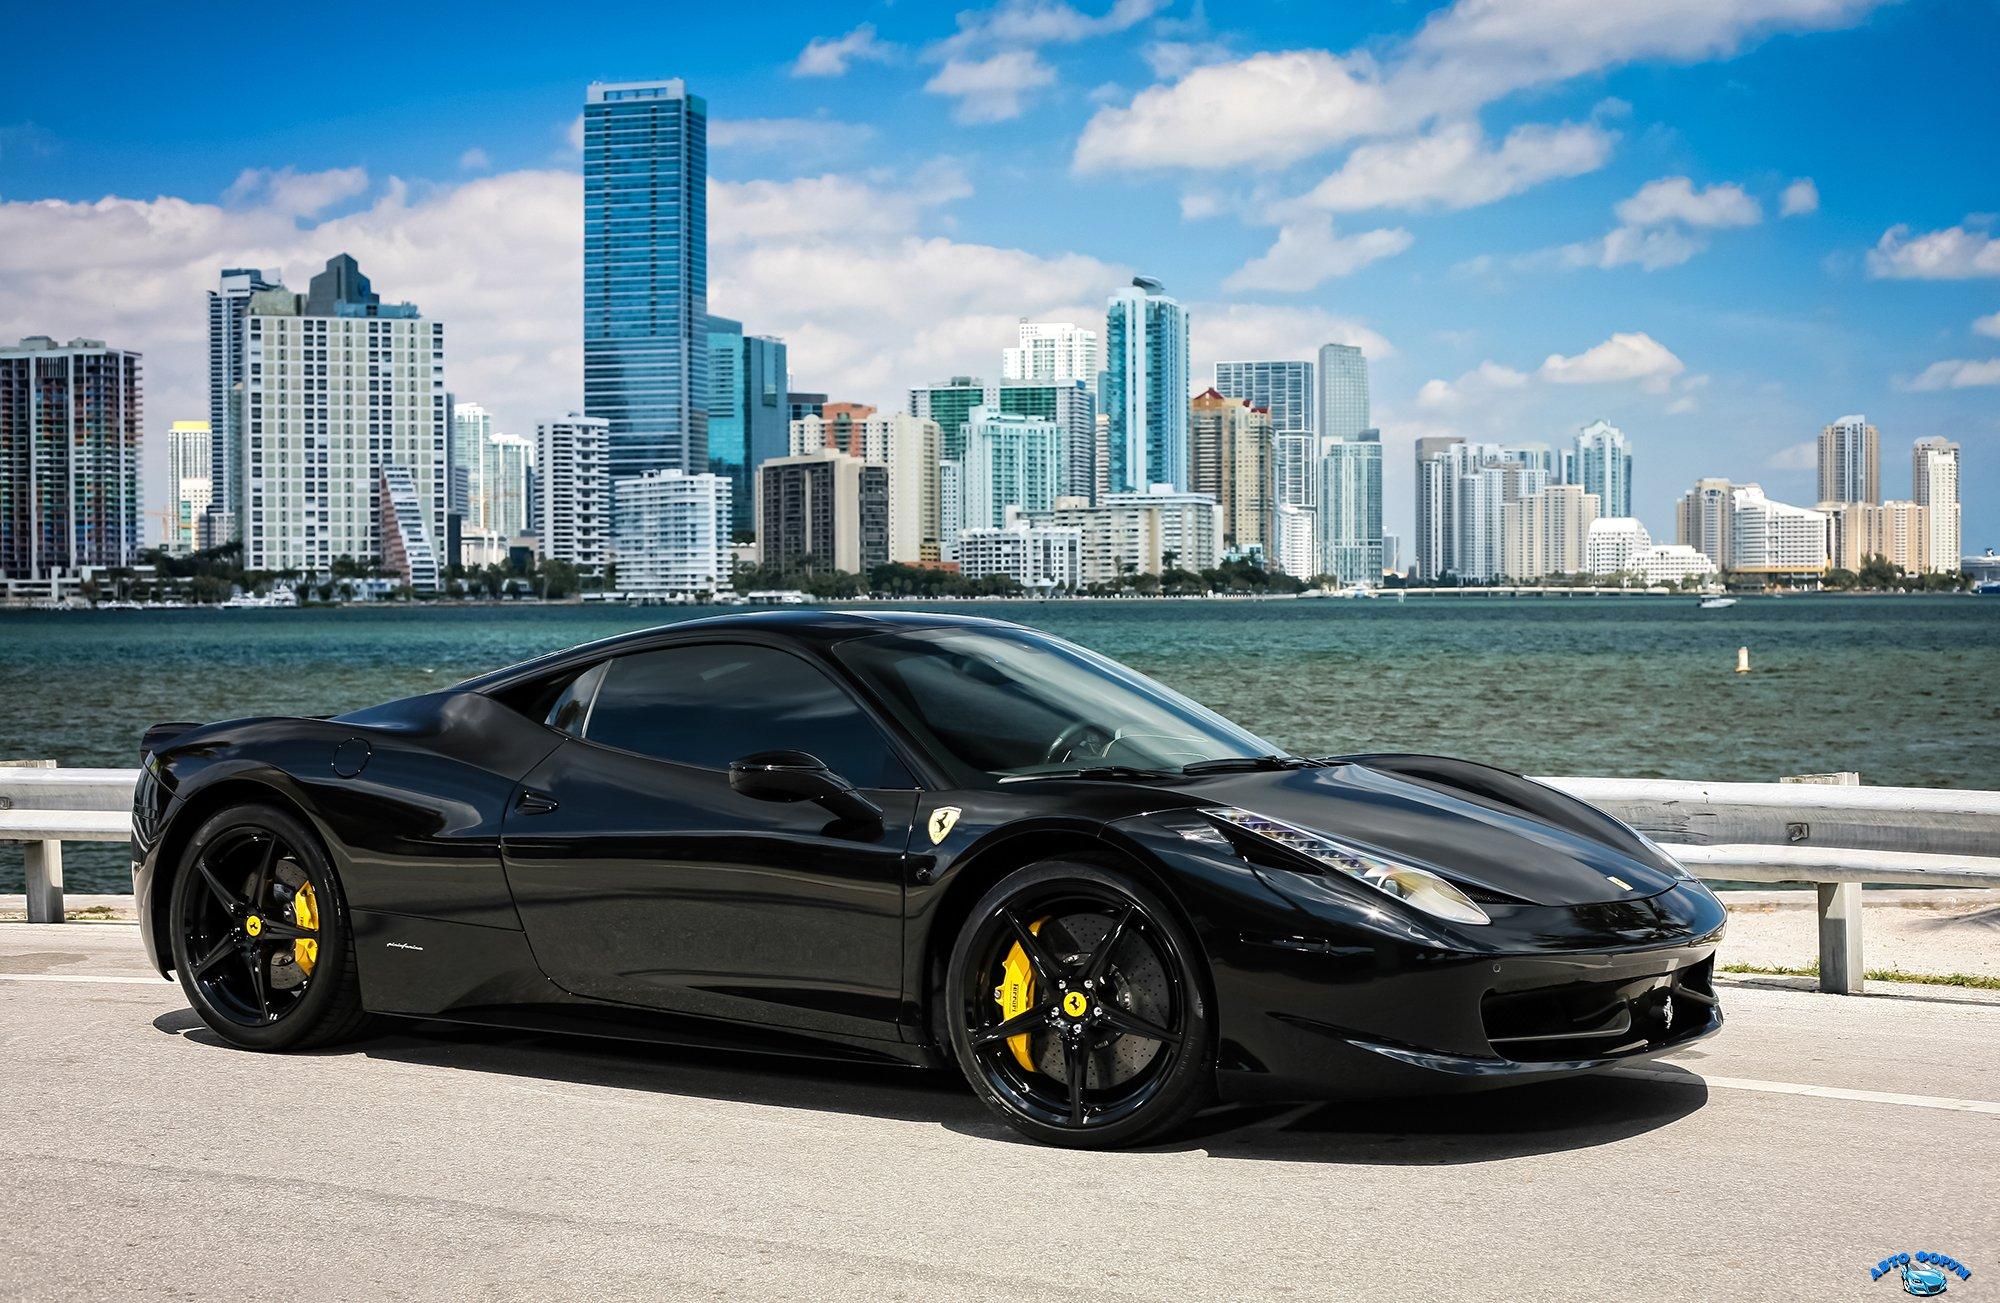 Ferrari_458_04_003.jpg